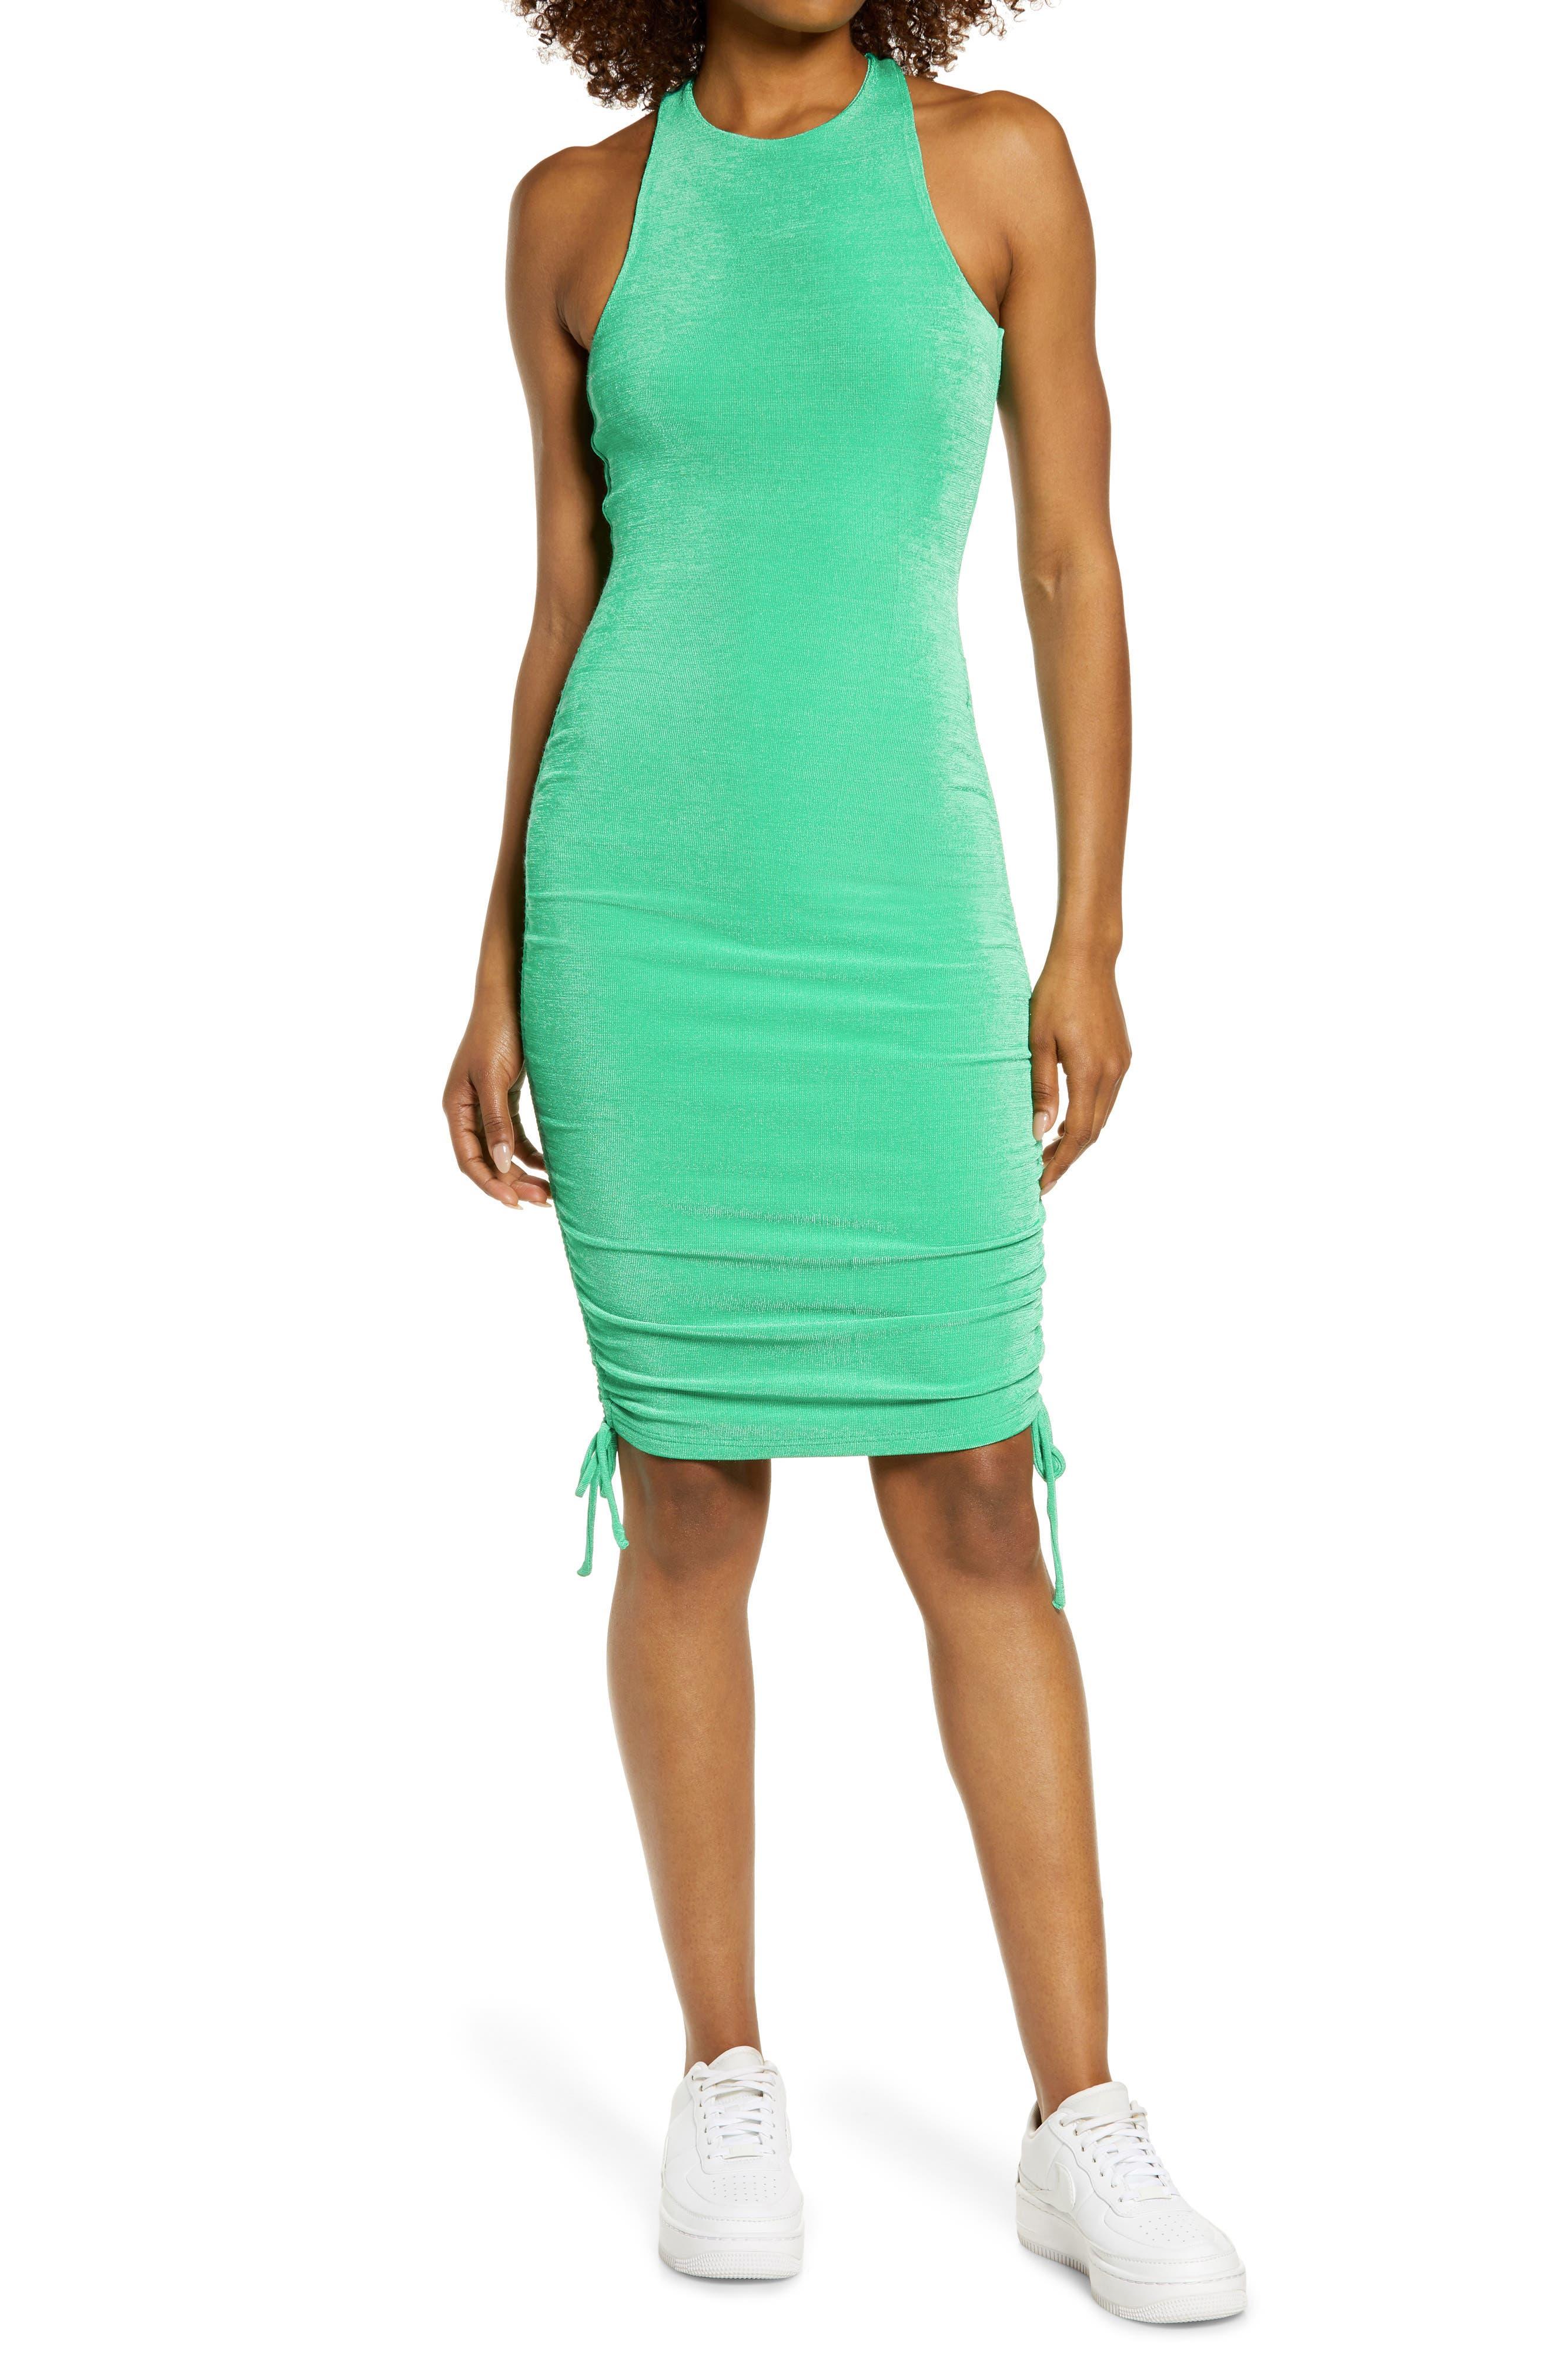 Women's By. dyln Drawstring Body-Con Dress